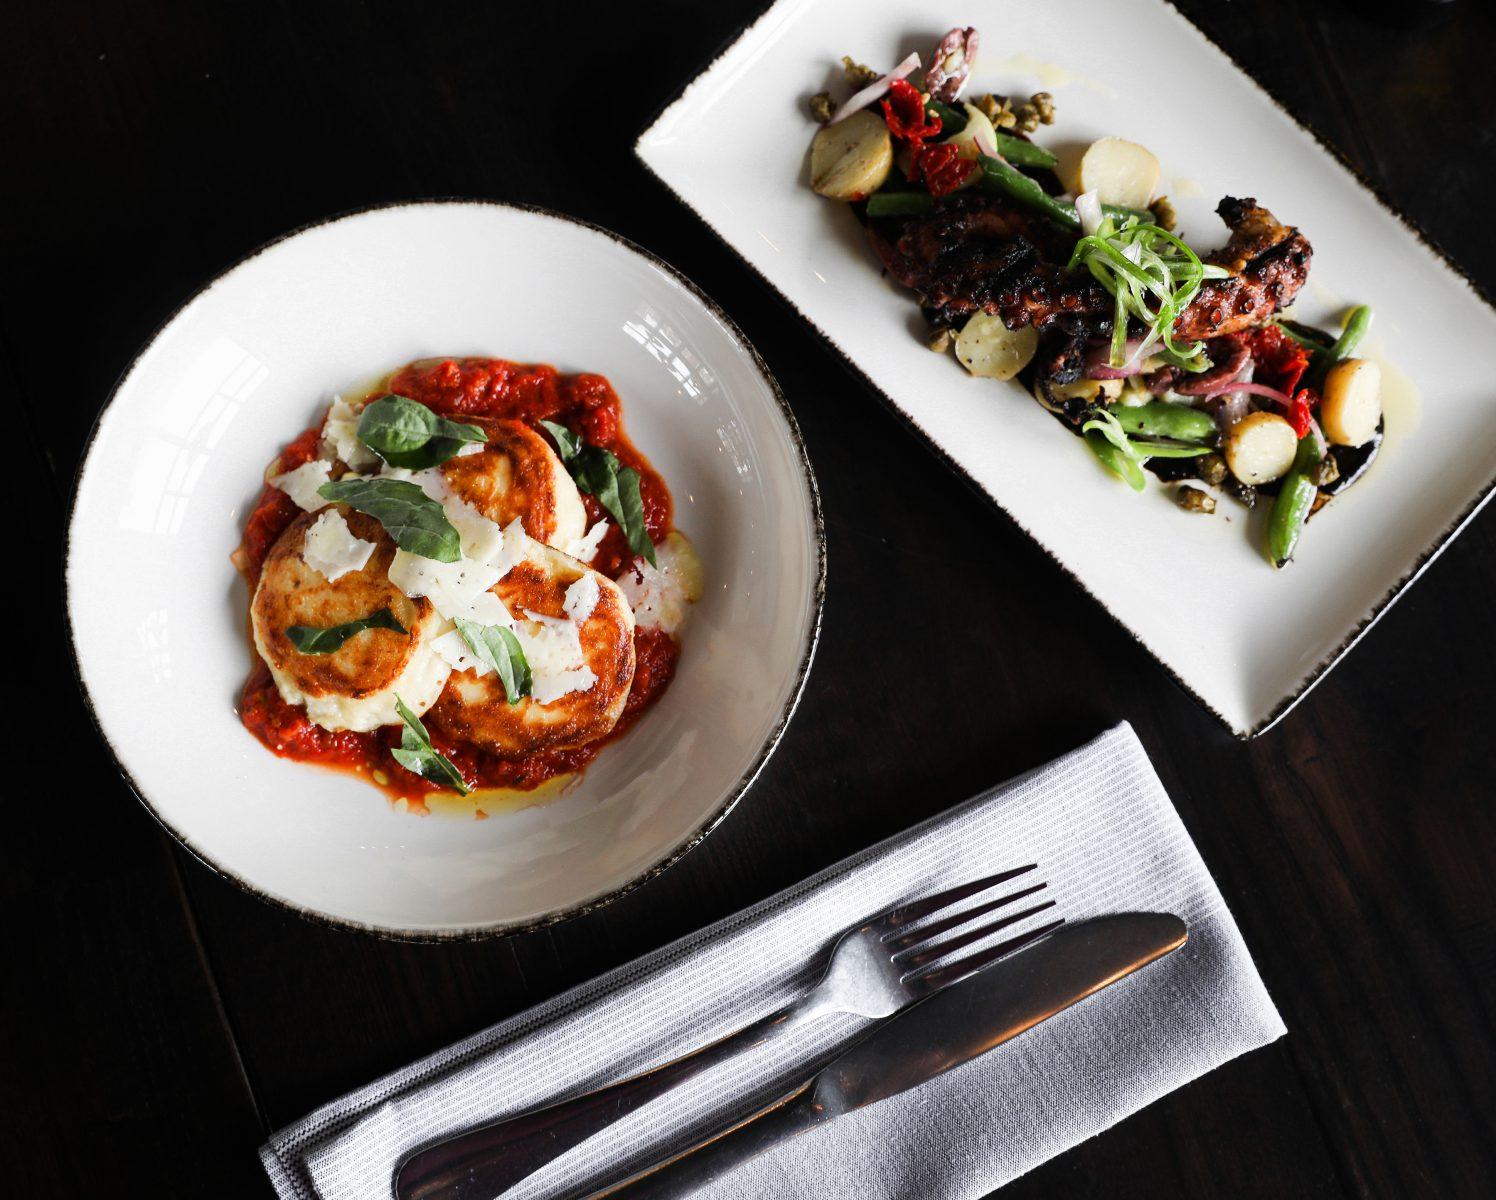 Starter ricotta fritta and salad